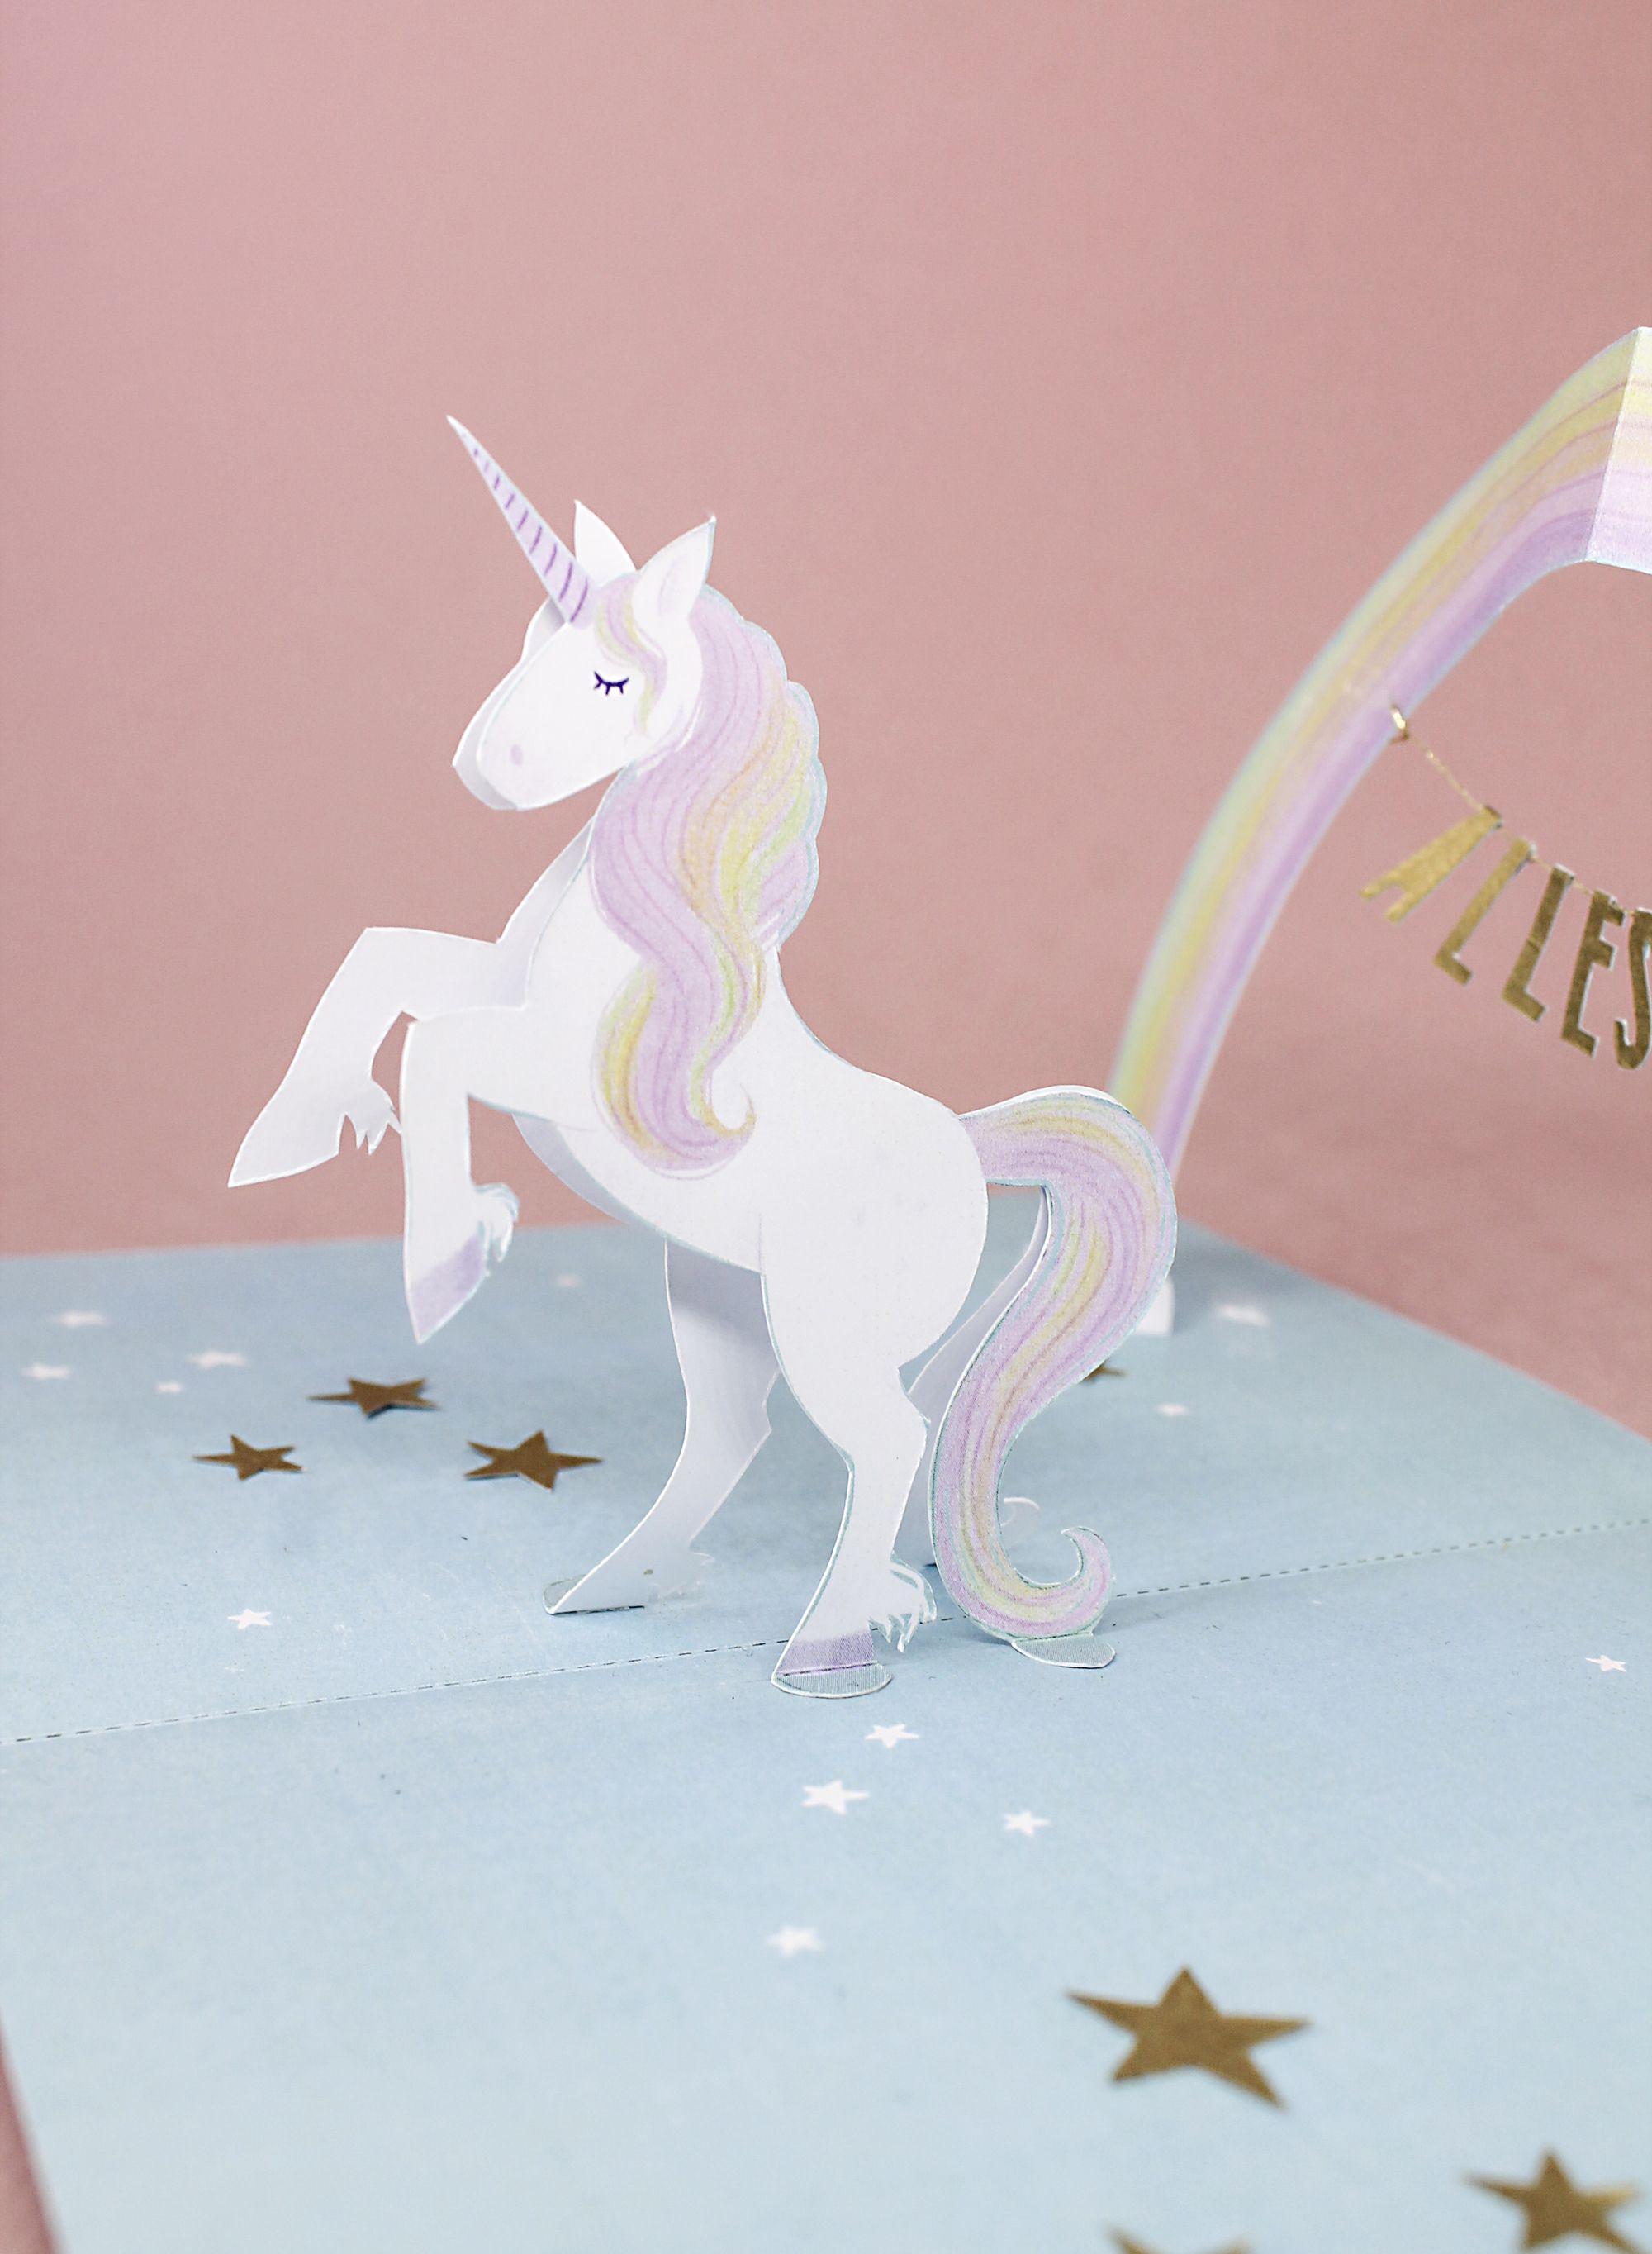 Unicorn Pop Up Birthday Card With Golden Details Handmade Unicorn Birthday Cards Diy Unicorn Birthday Card Unicorn Card